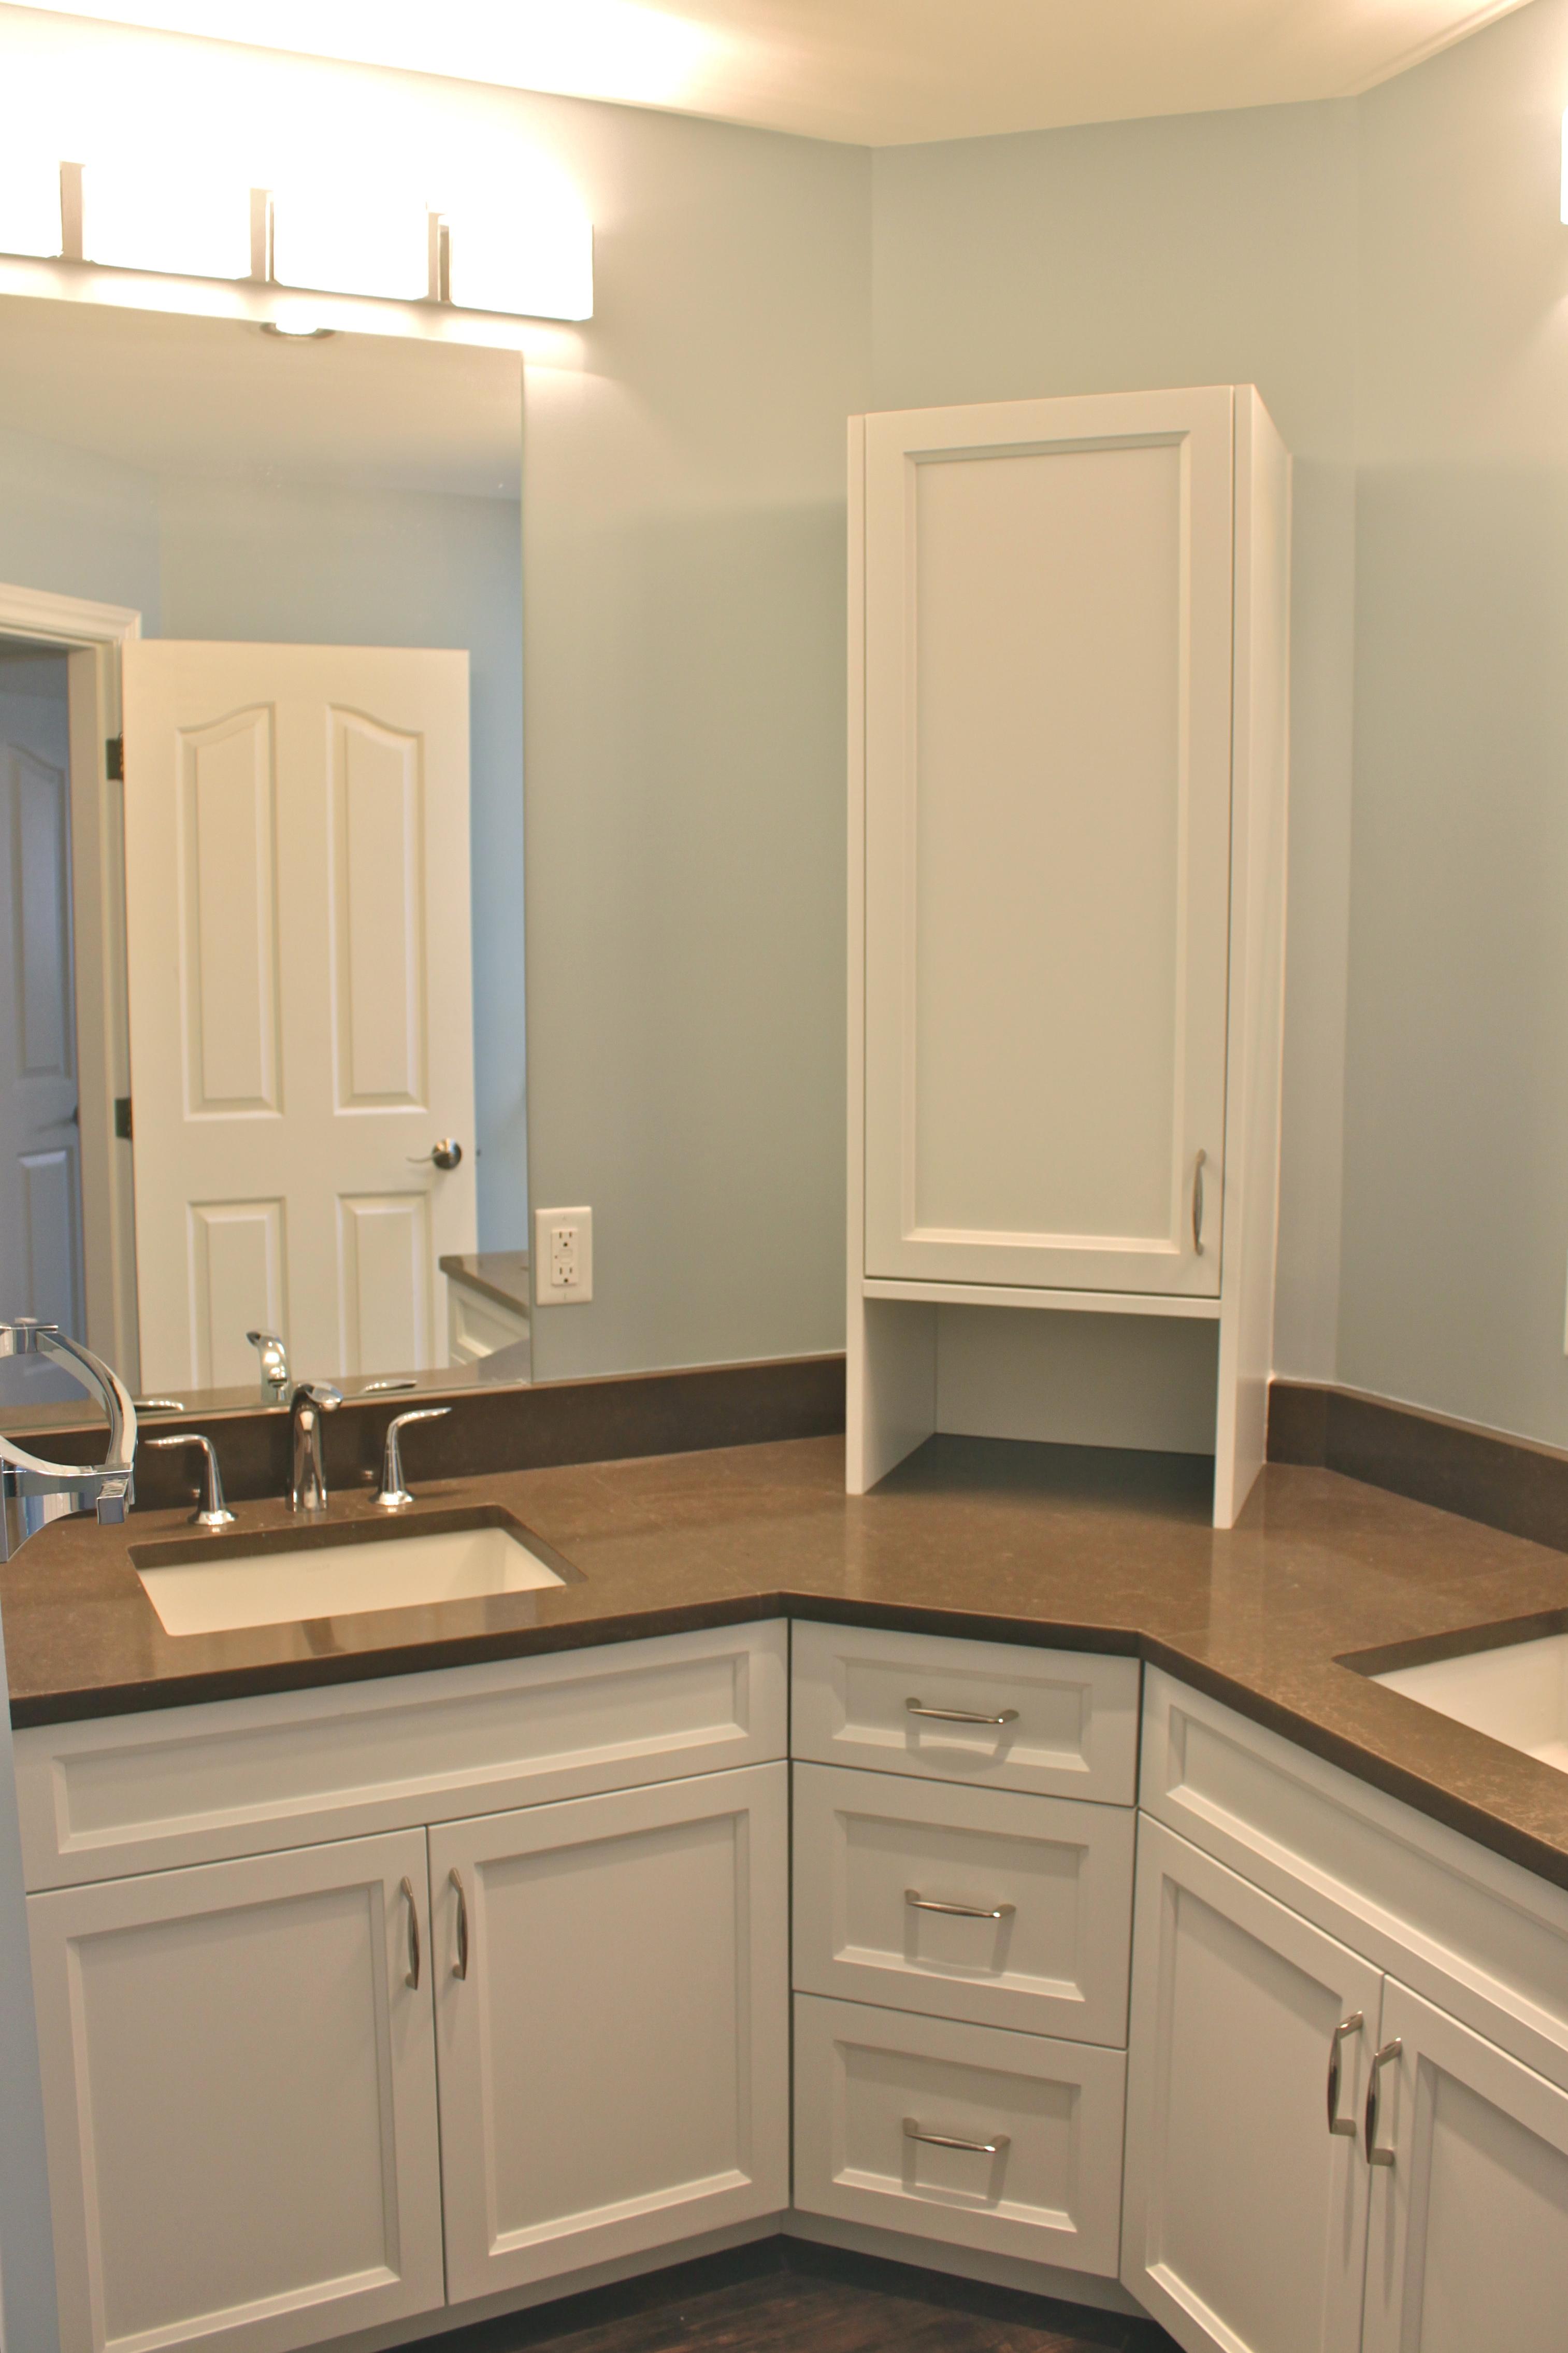 Bathroom Renovations in Surrey, BC - Novero Homes and ...